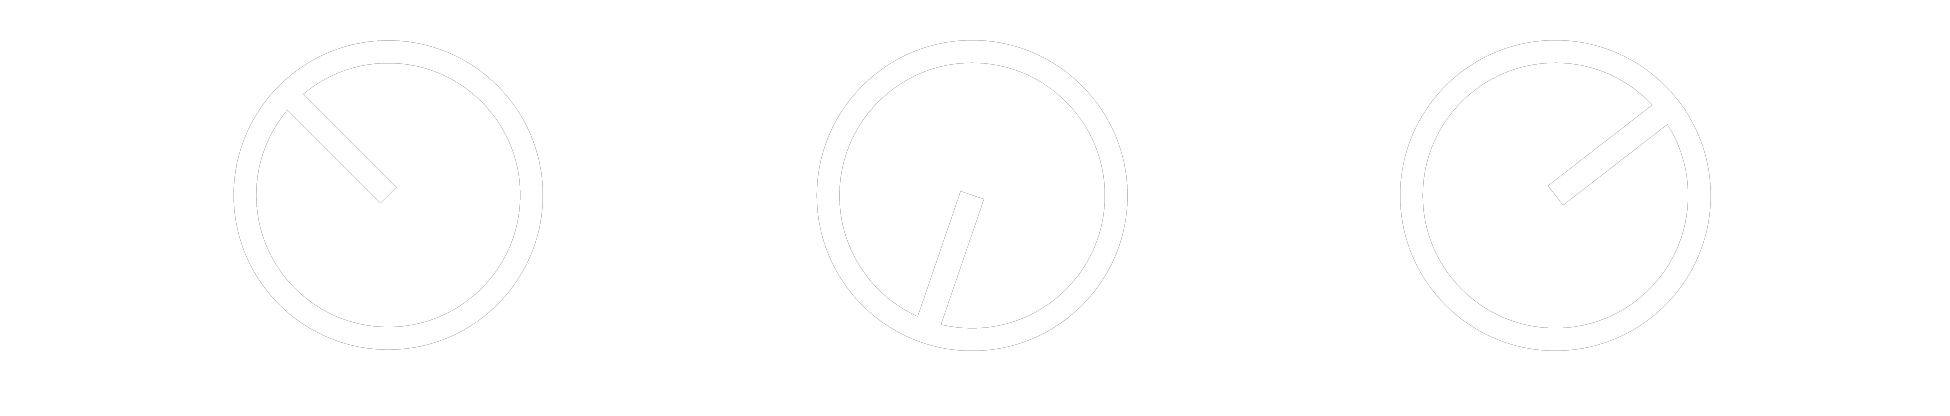 Scopetune_Logo_160519_Transparent_Web-WHITE-Footer-SL-2019-05-15.png